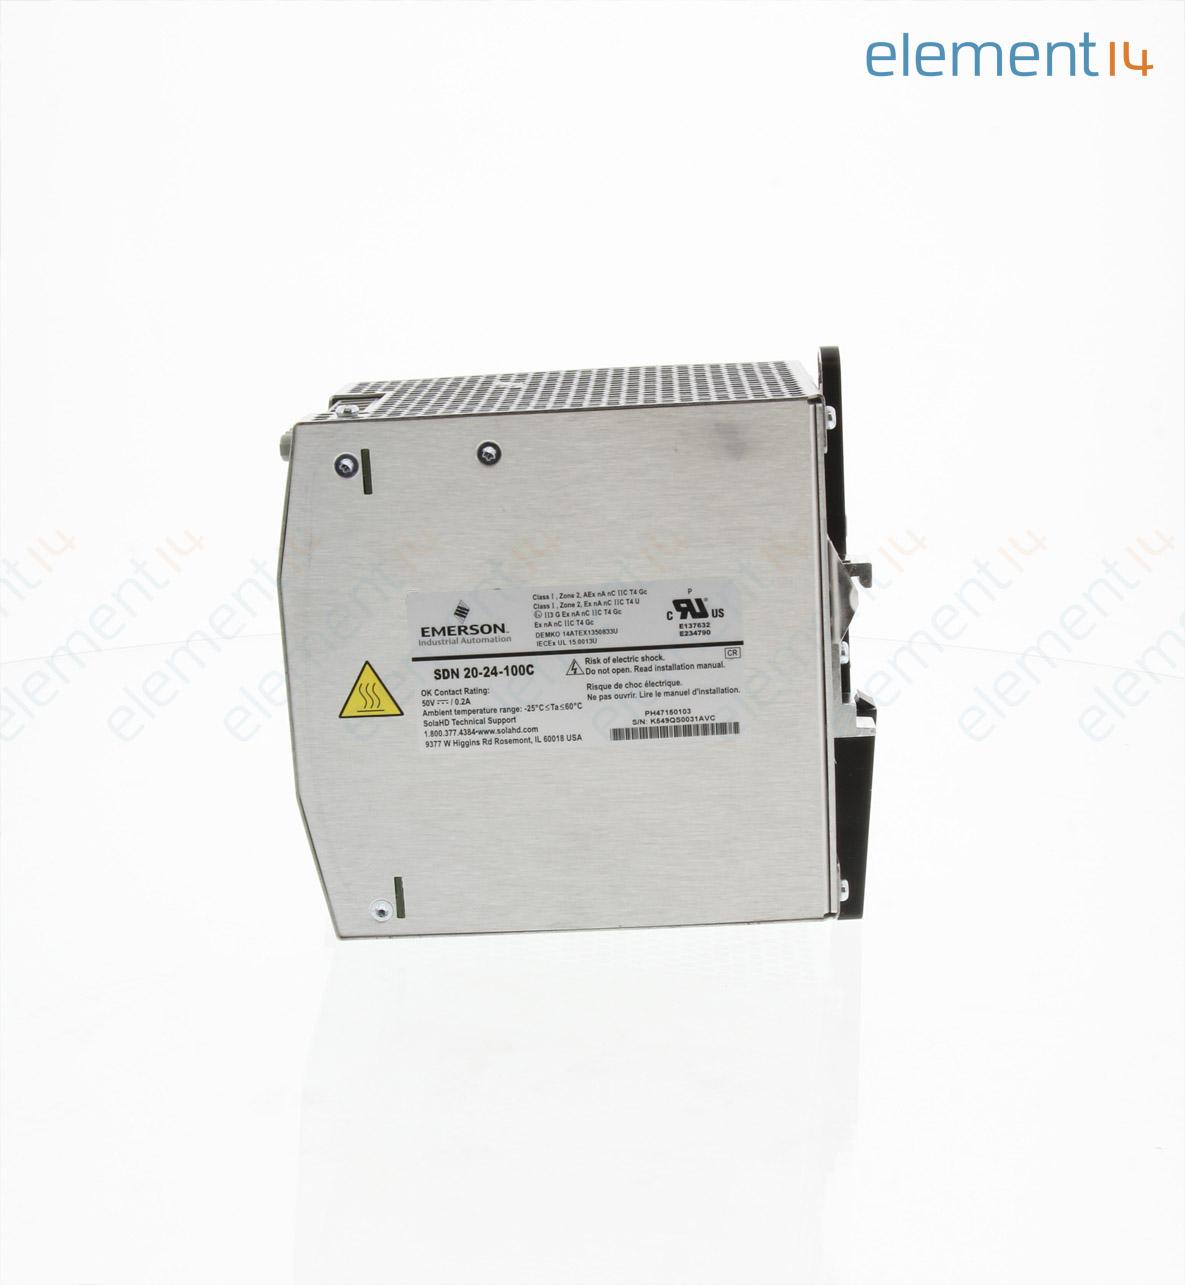 AC/DC DIN Rail Power Supply (PSU), ITE, 1 Output, 480 W, 24 VDC, 20 A